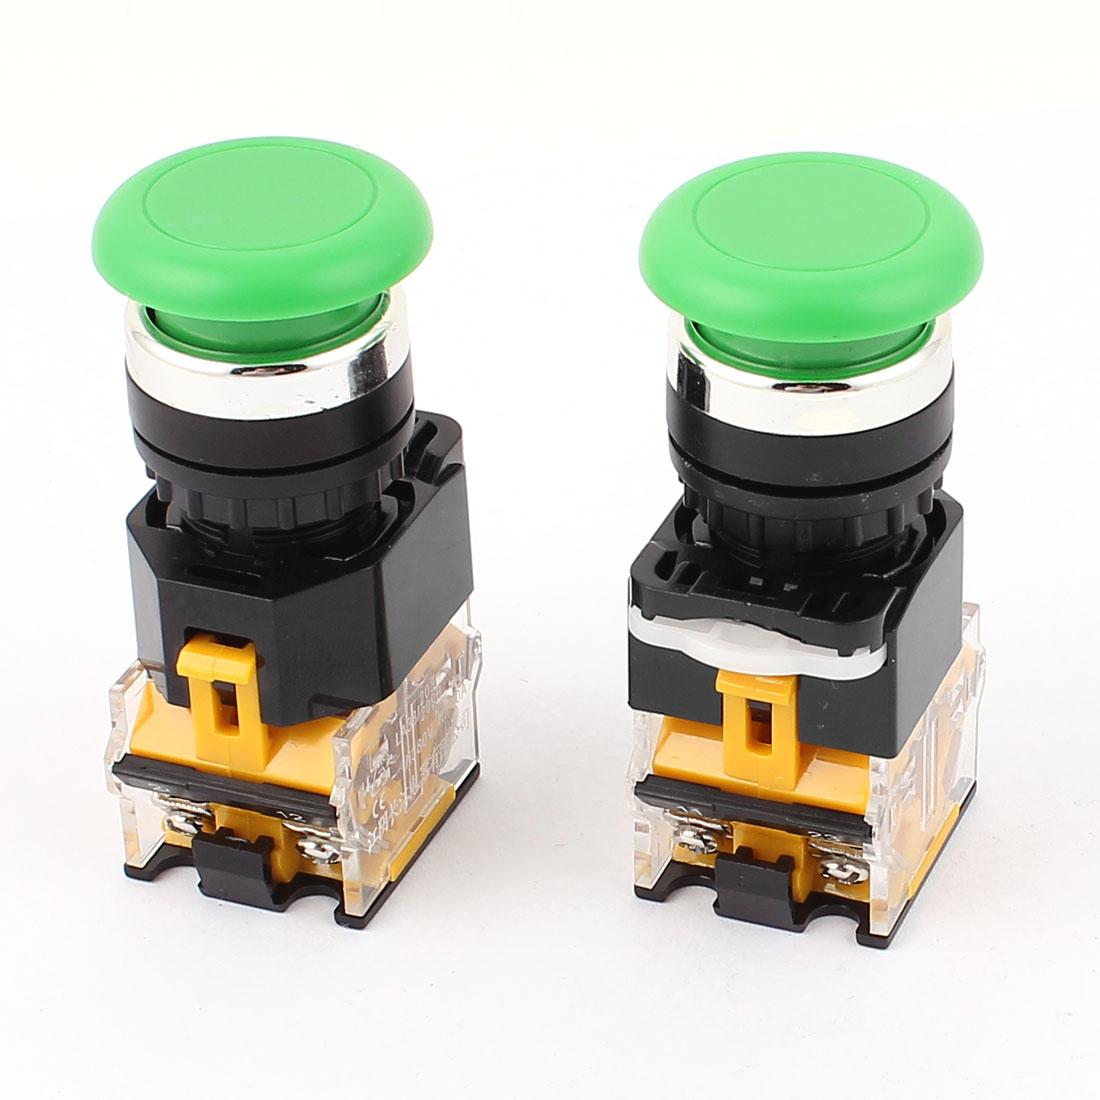 2Pcs 380V 10A DPST Momentary Mushroom Head Push Button Switch Green